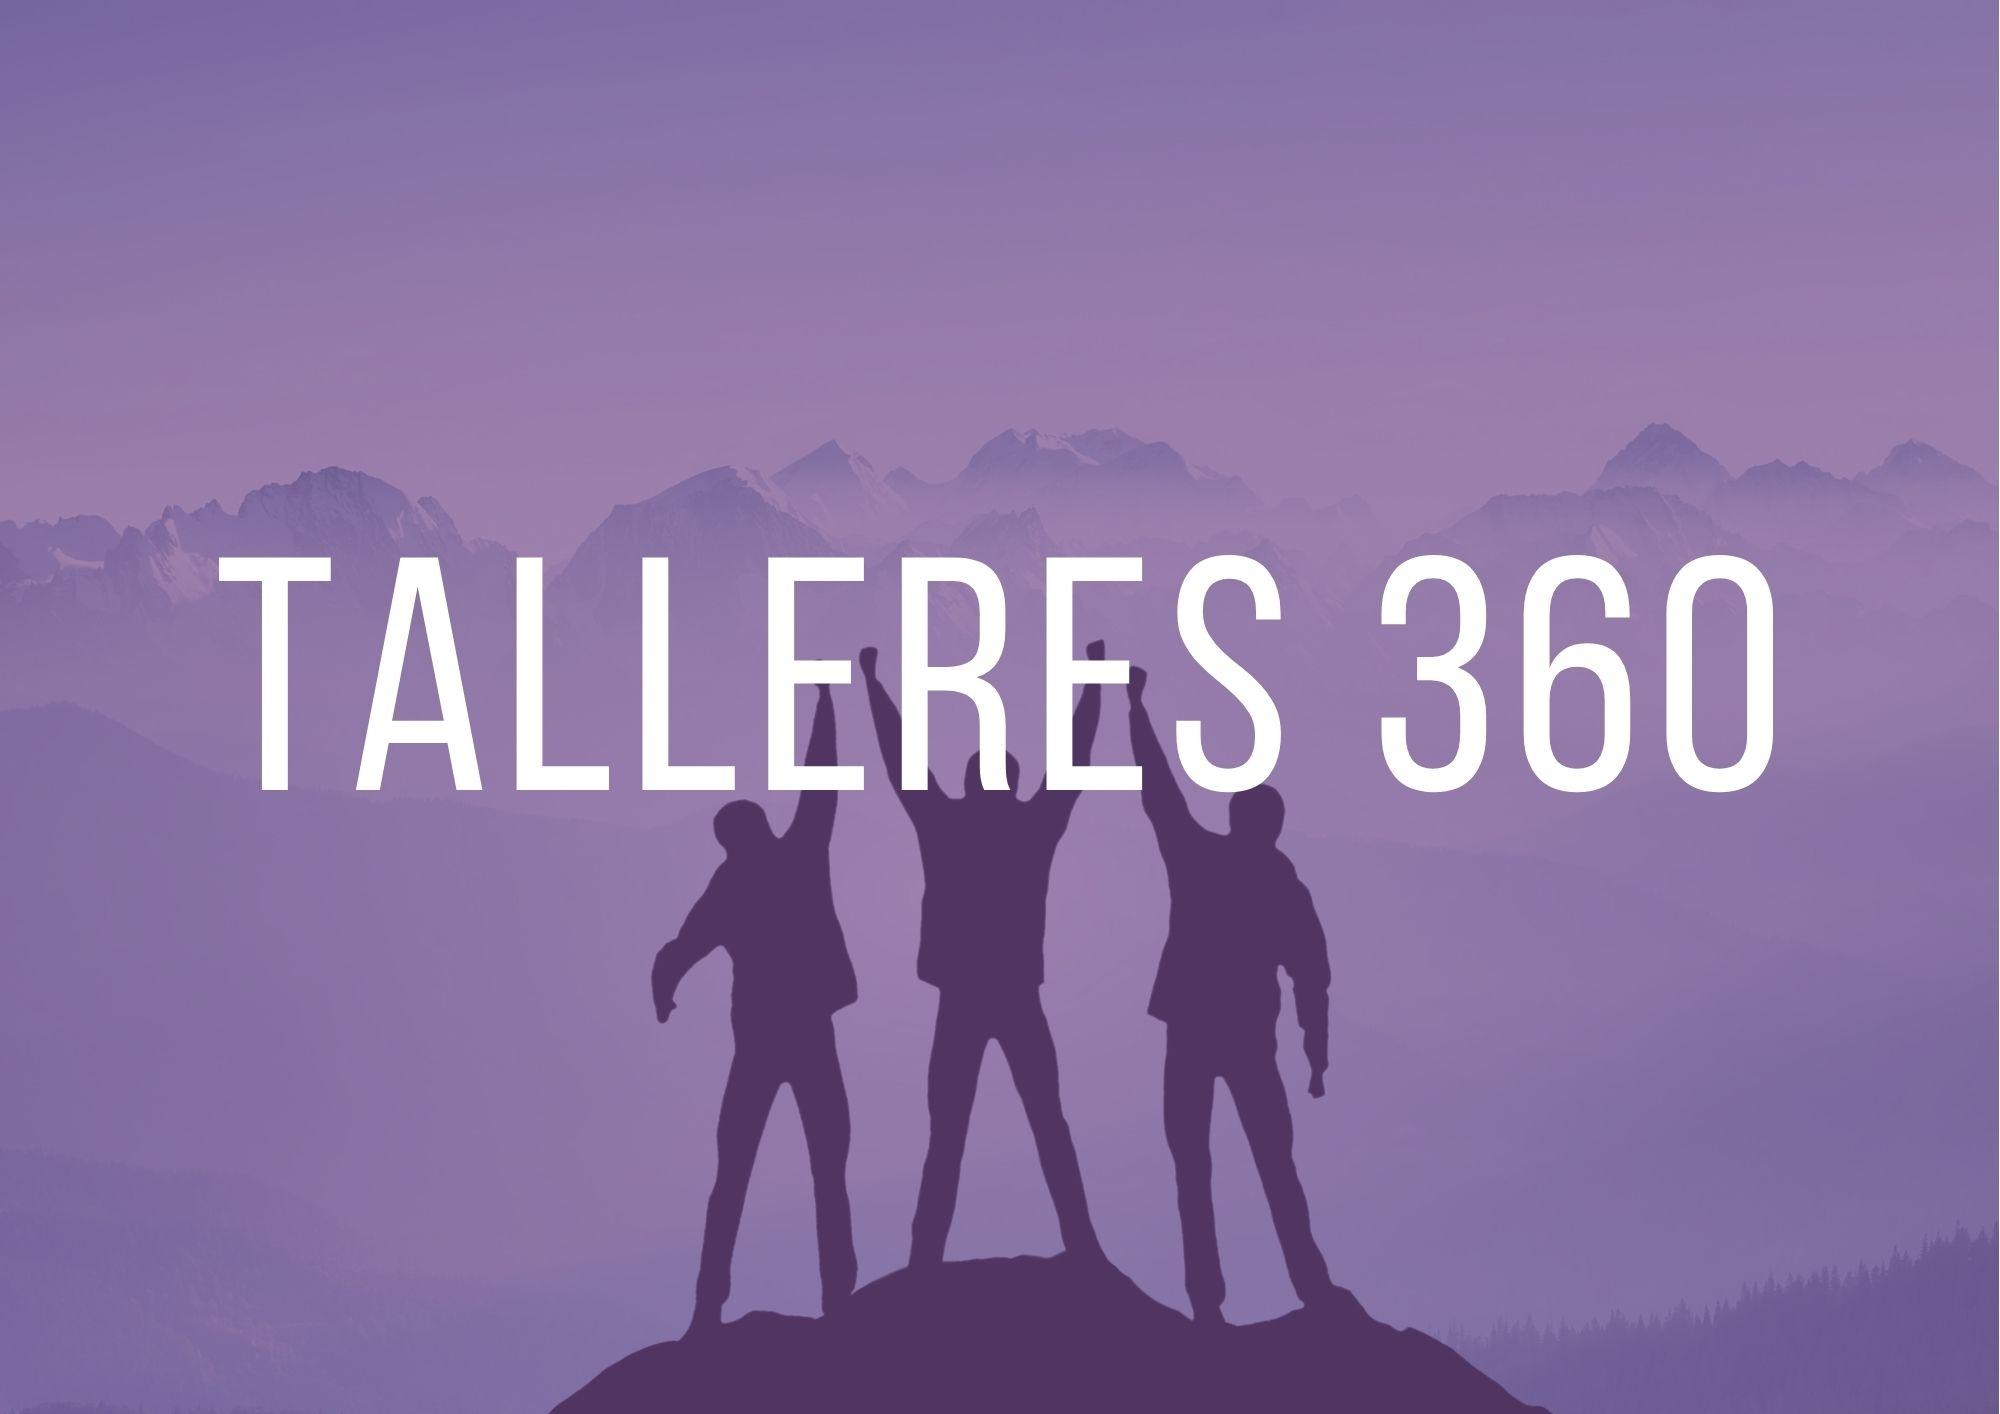 Talleres360